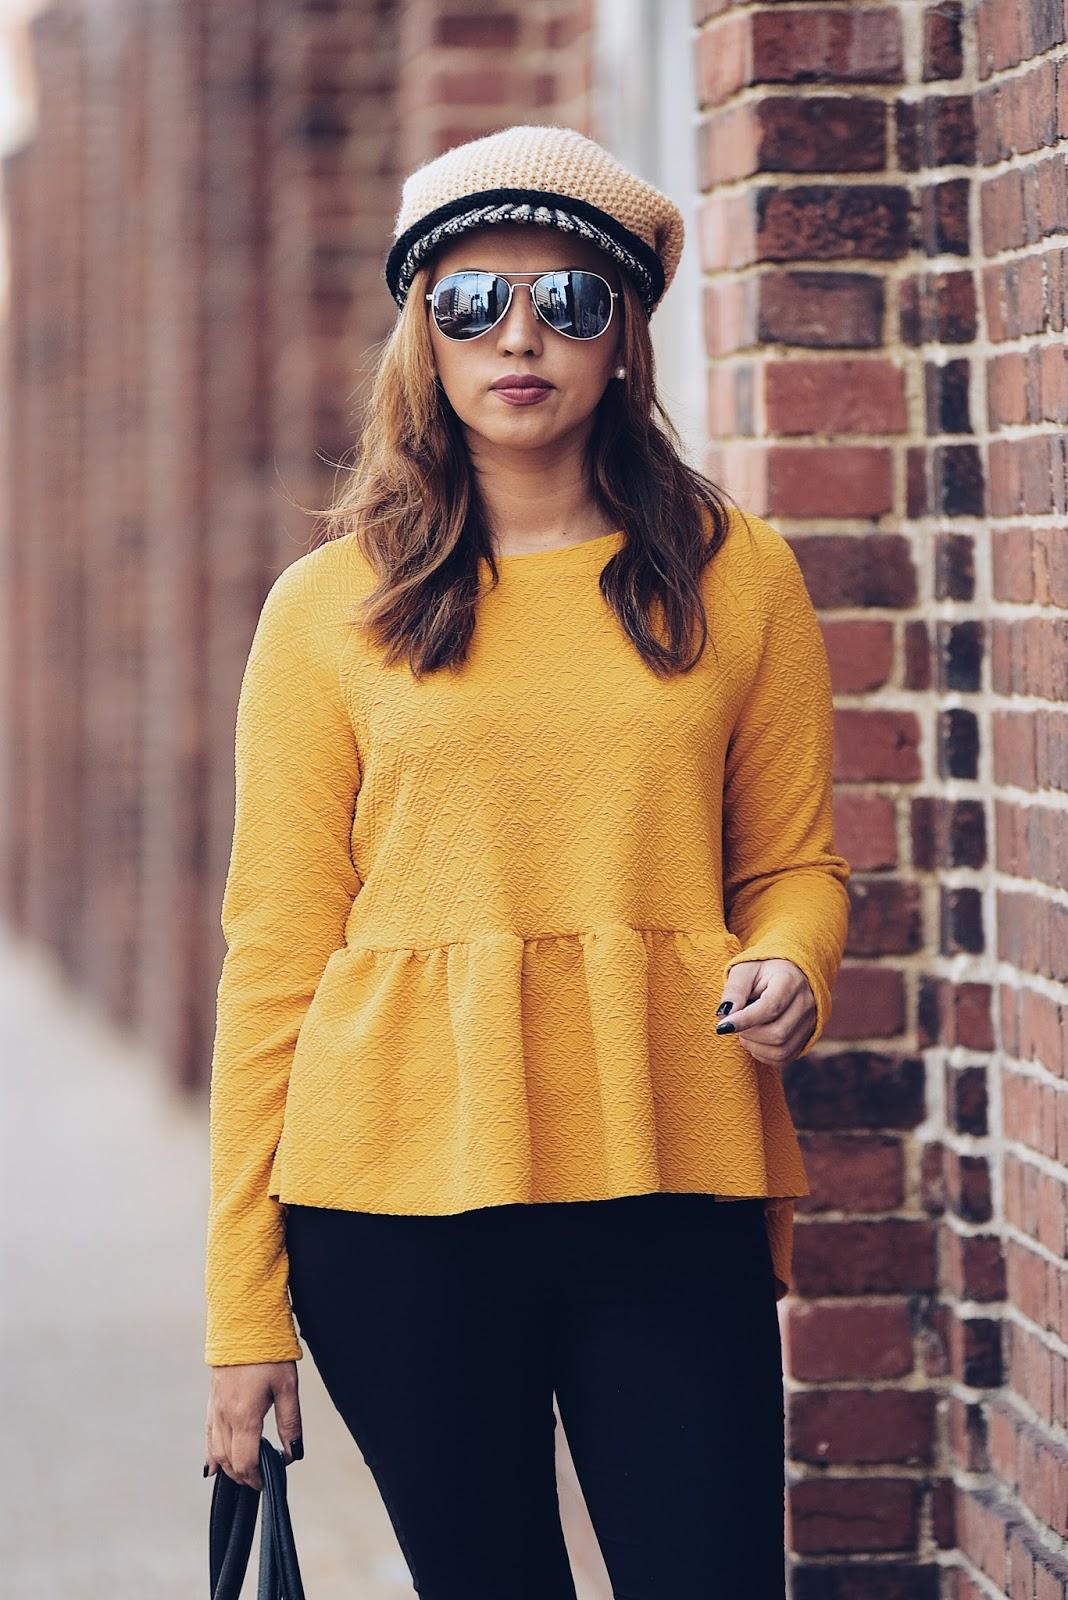 Some Mustard Yellow  by MariEstilo-look of the day-fashionblogger-streetstyle-fashionista-moda-fallfashion